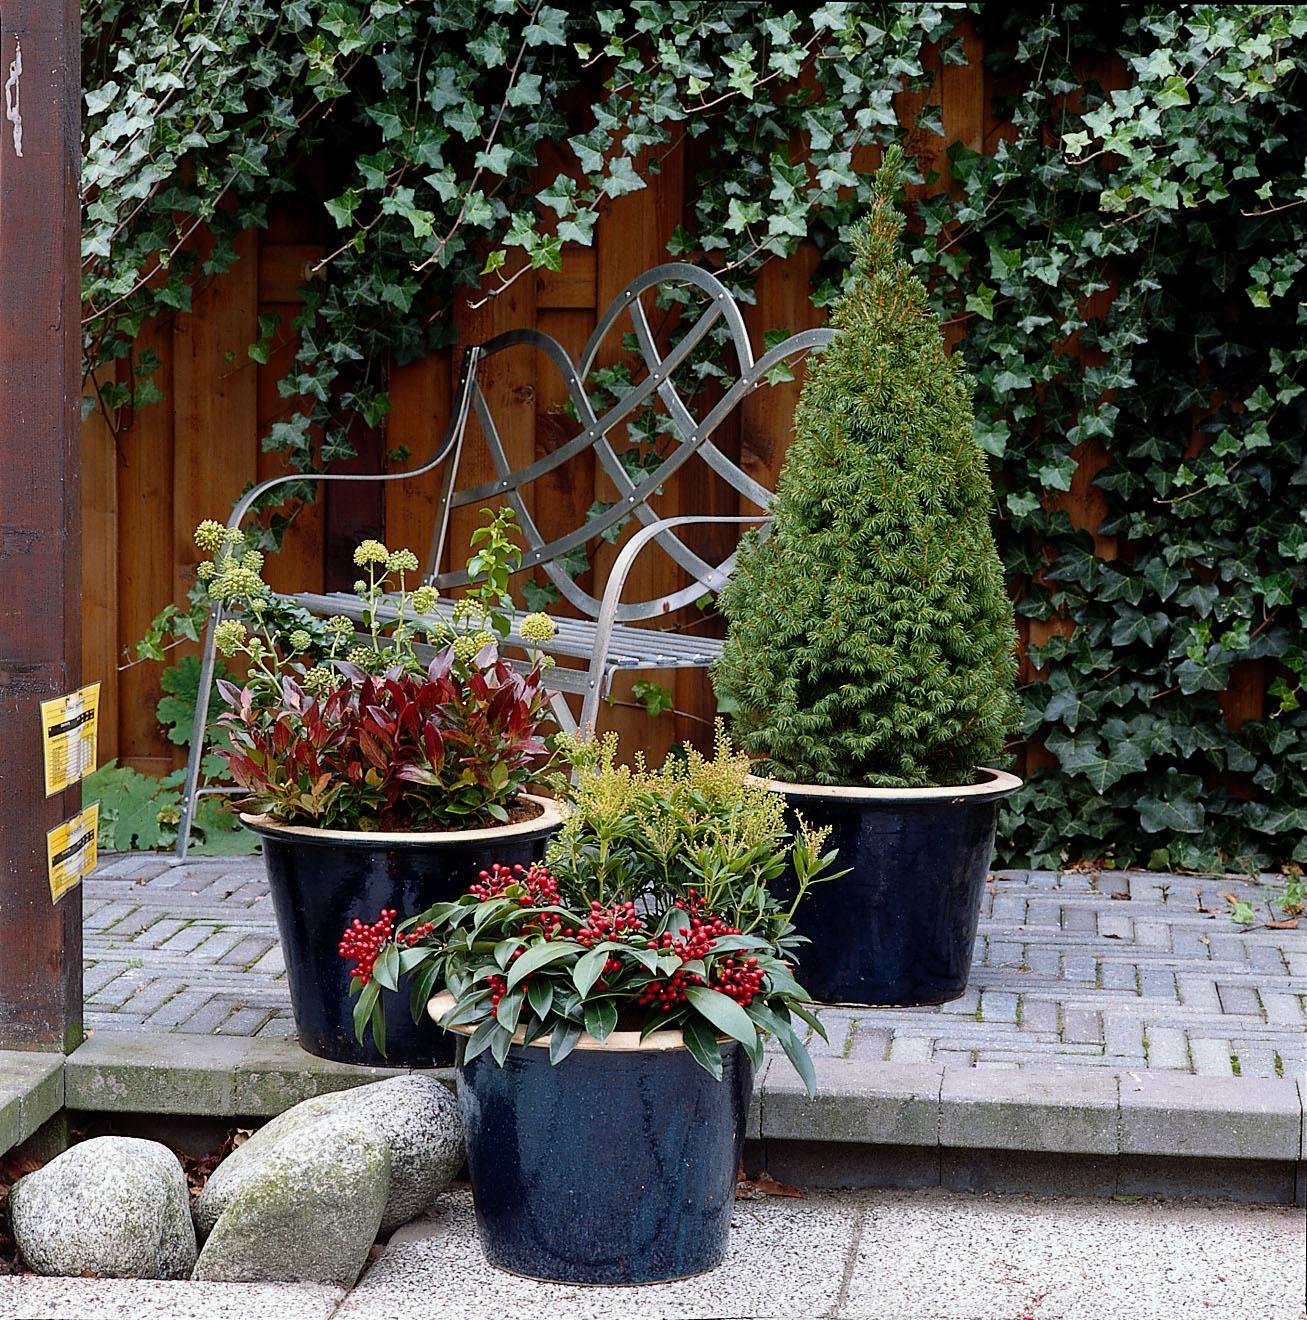 https://www.tuincentrum.nl/media/catalog/product/cache/1/small_image/9df78eab33525d08d6e5fb8d27136e95/k/e/kerstboom-klein-2.jpg